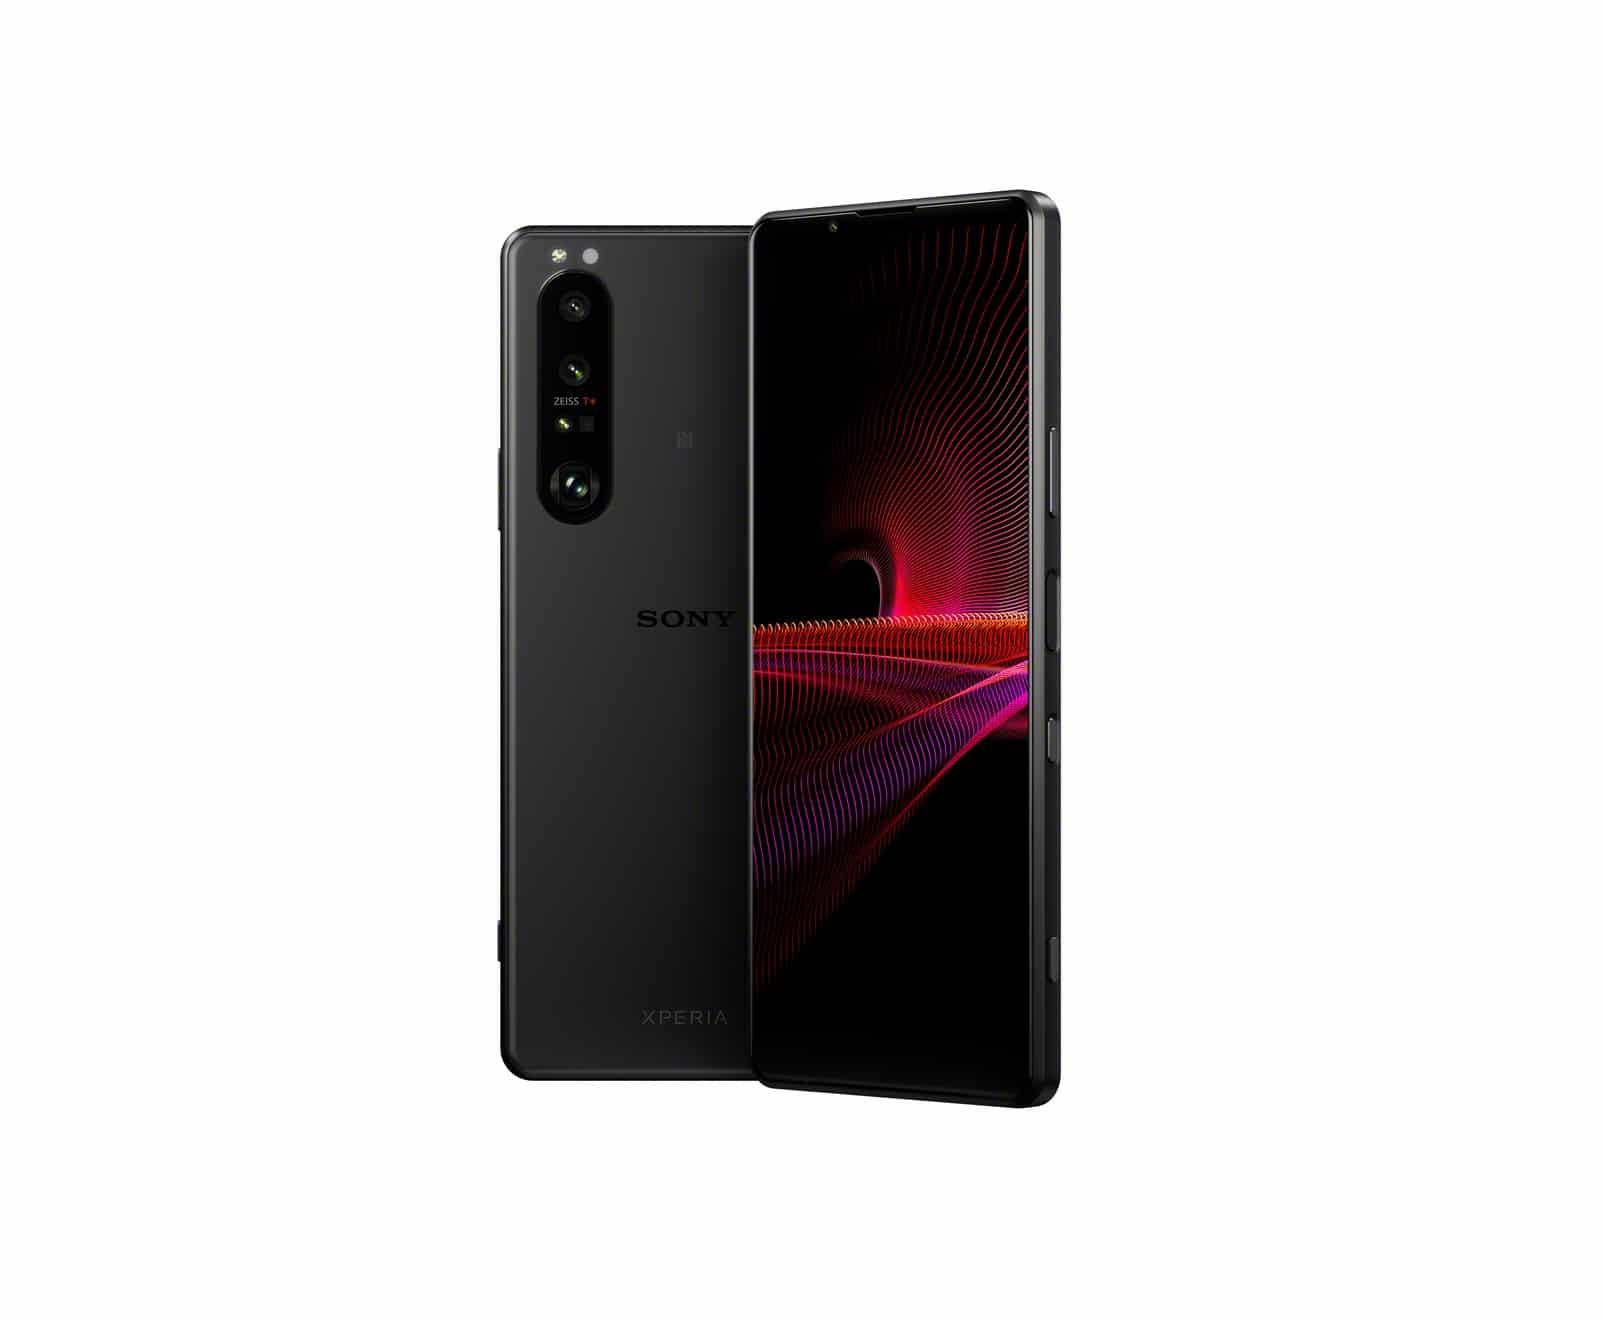 4K-goes-Mobile-Sony-Xperia-1-III-mit-4K-AMOLED-Display-vorgestellt